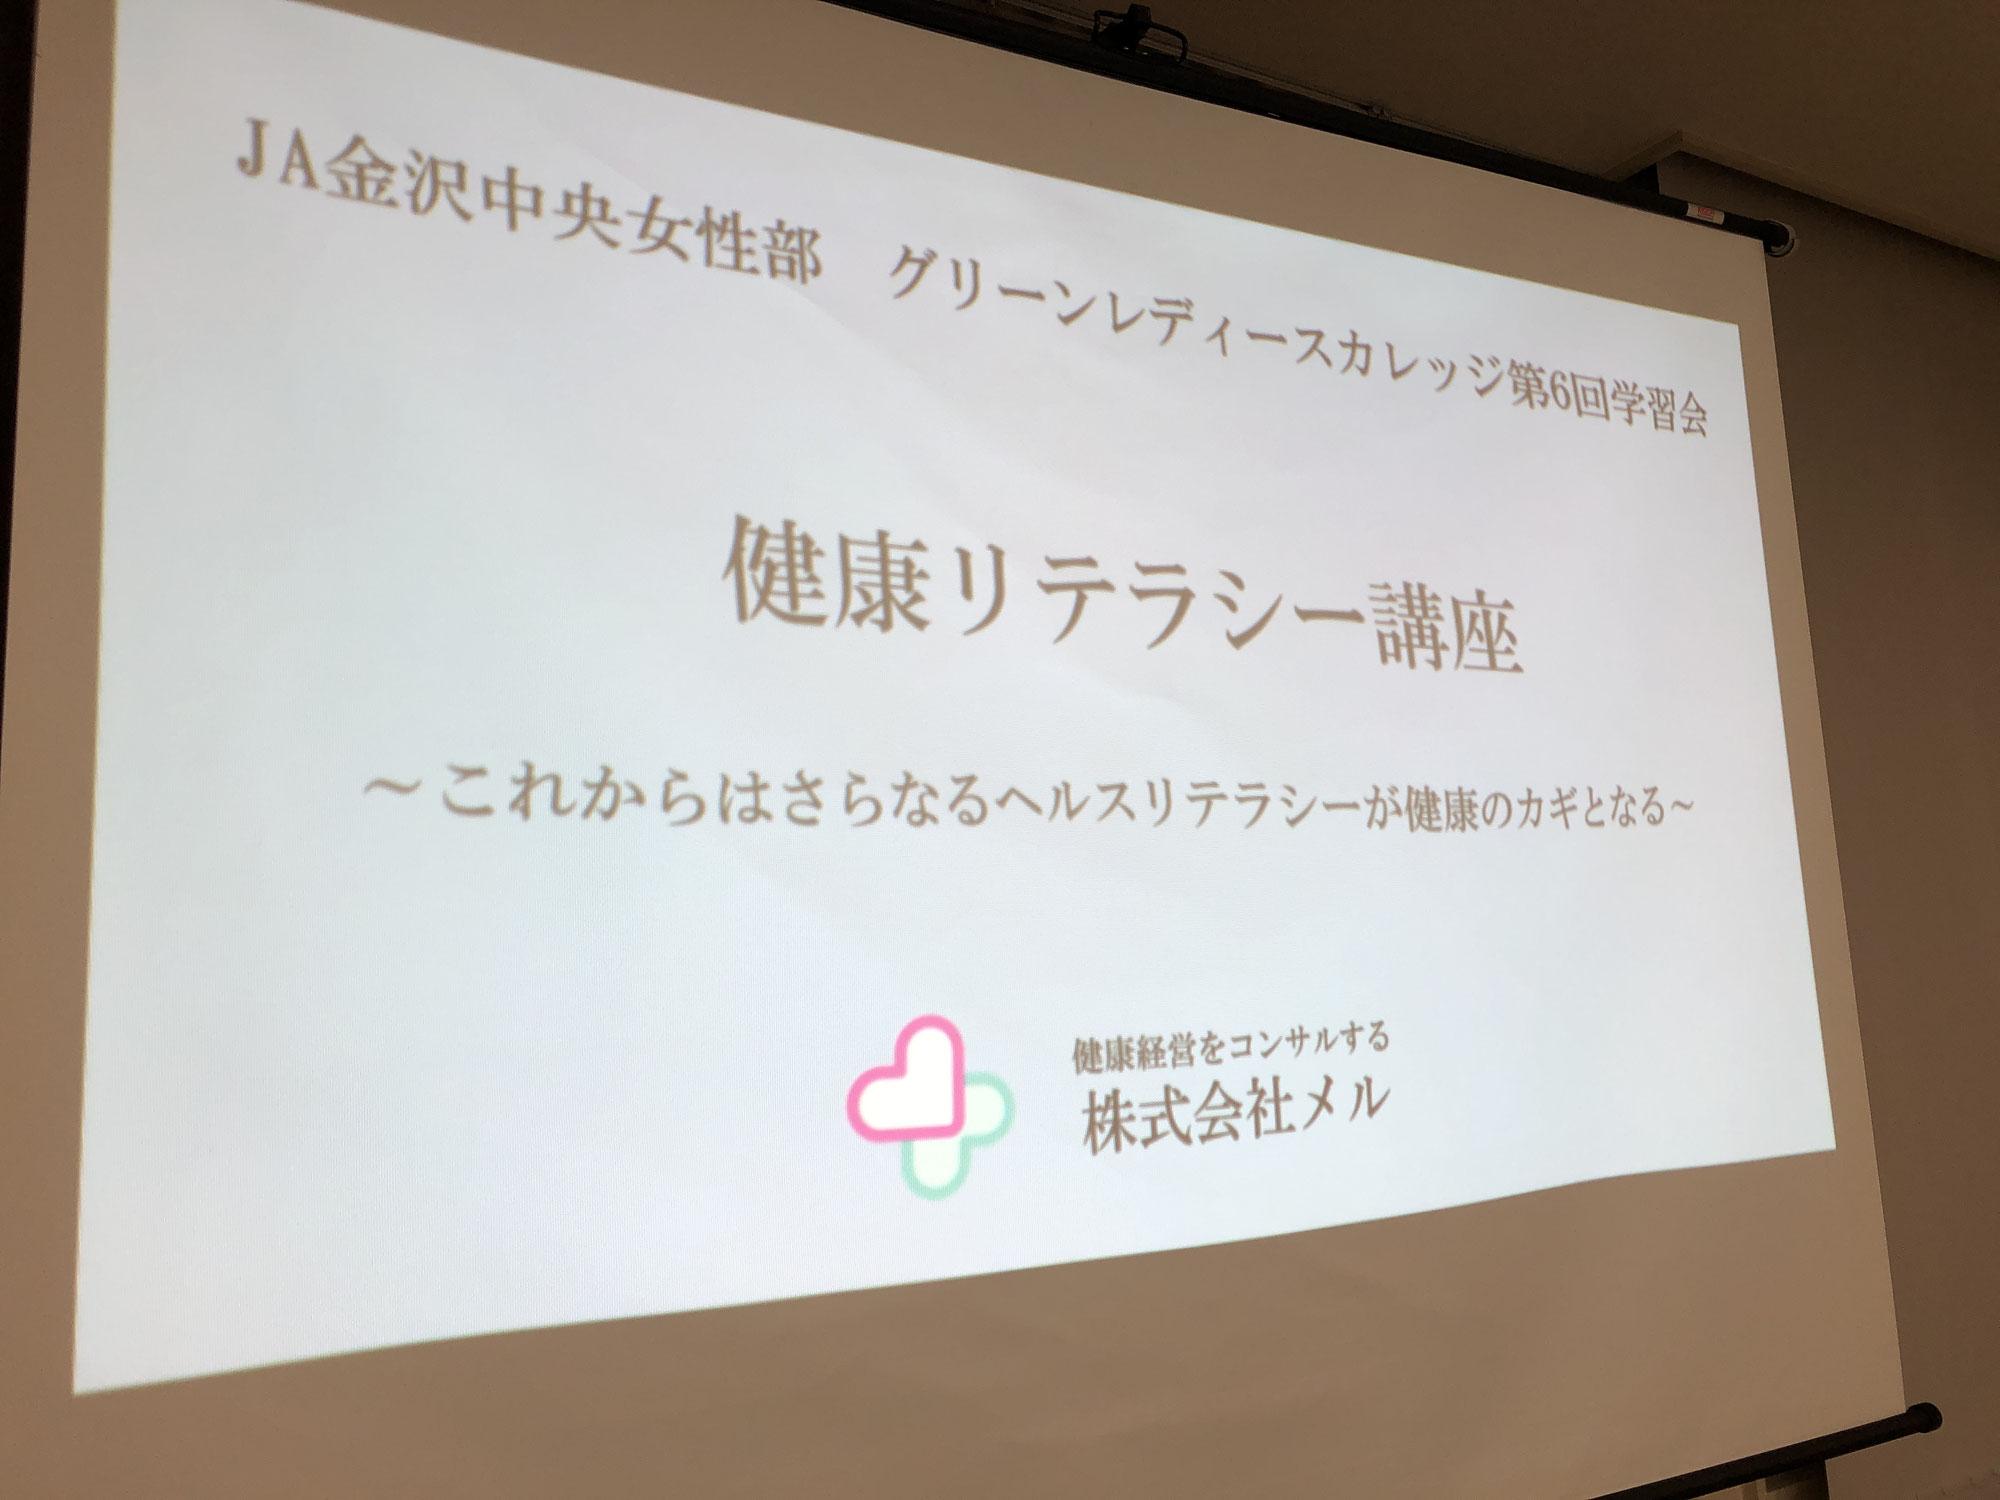 JA金沢中央女性部グリーンレディースカレッジ第6回学習会